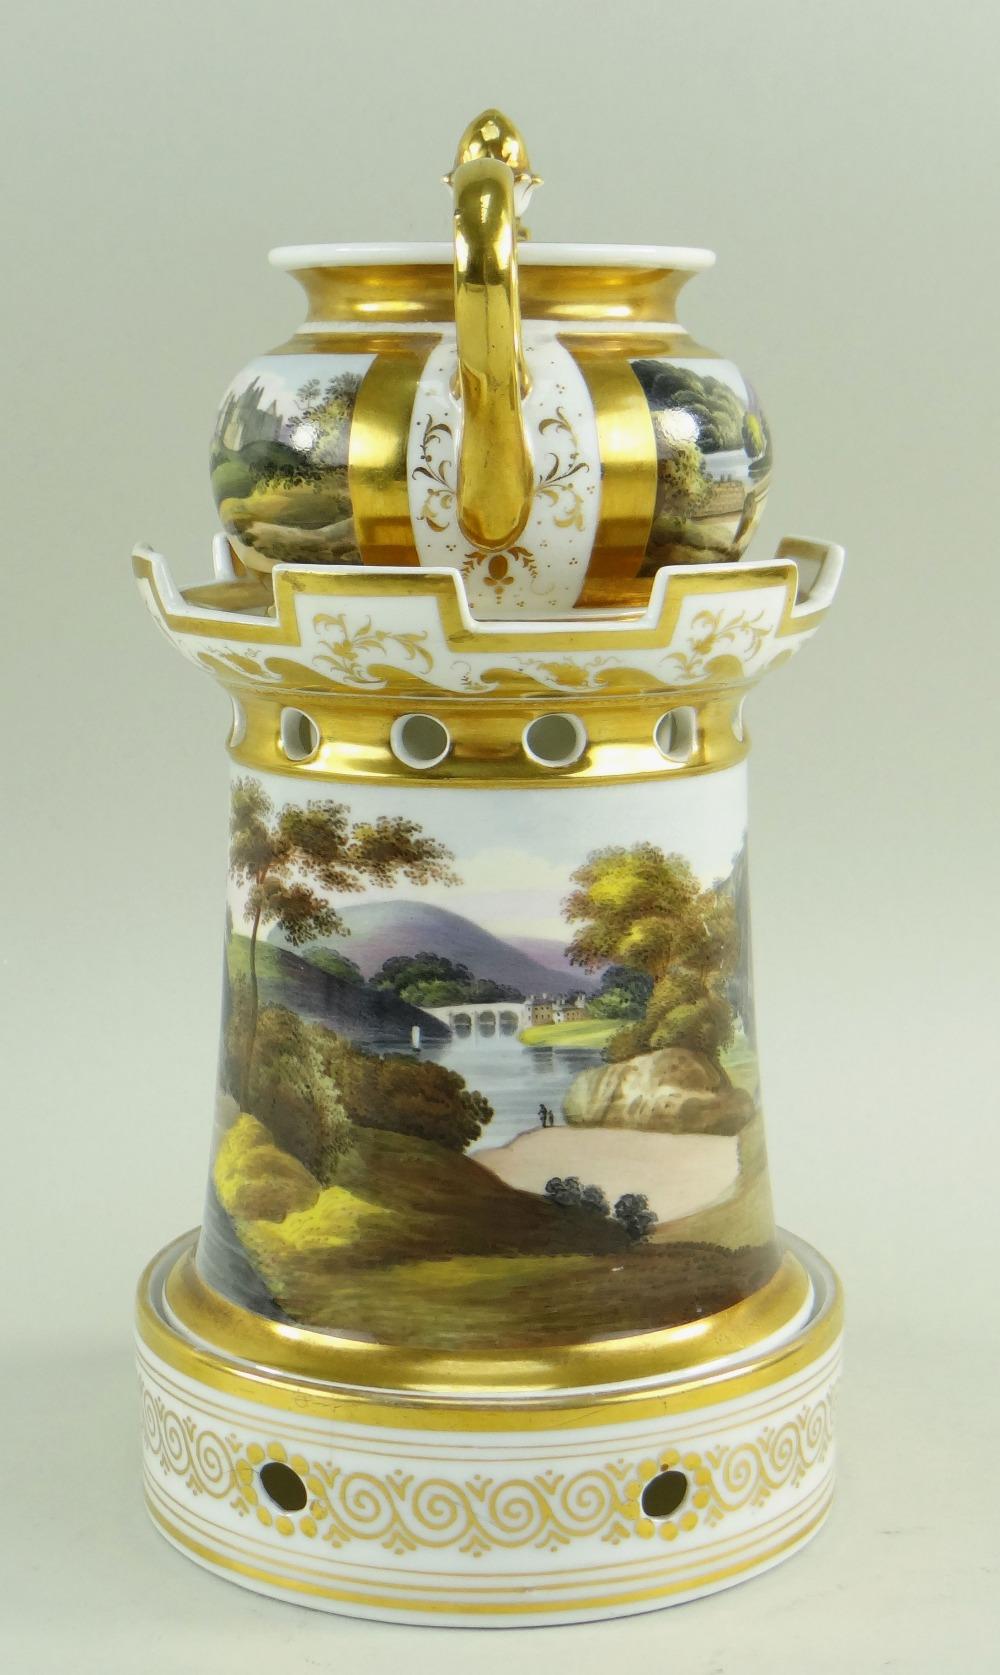 A WELSH LANDSCAPE ENGLISH PORCELAIN VEILLEUSE (tea-pot and warming stand) comprising miniature - Image 4 of 5